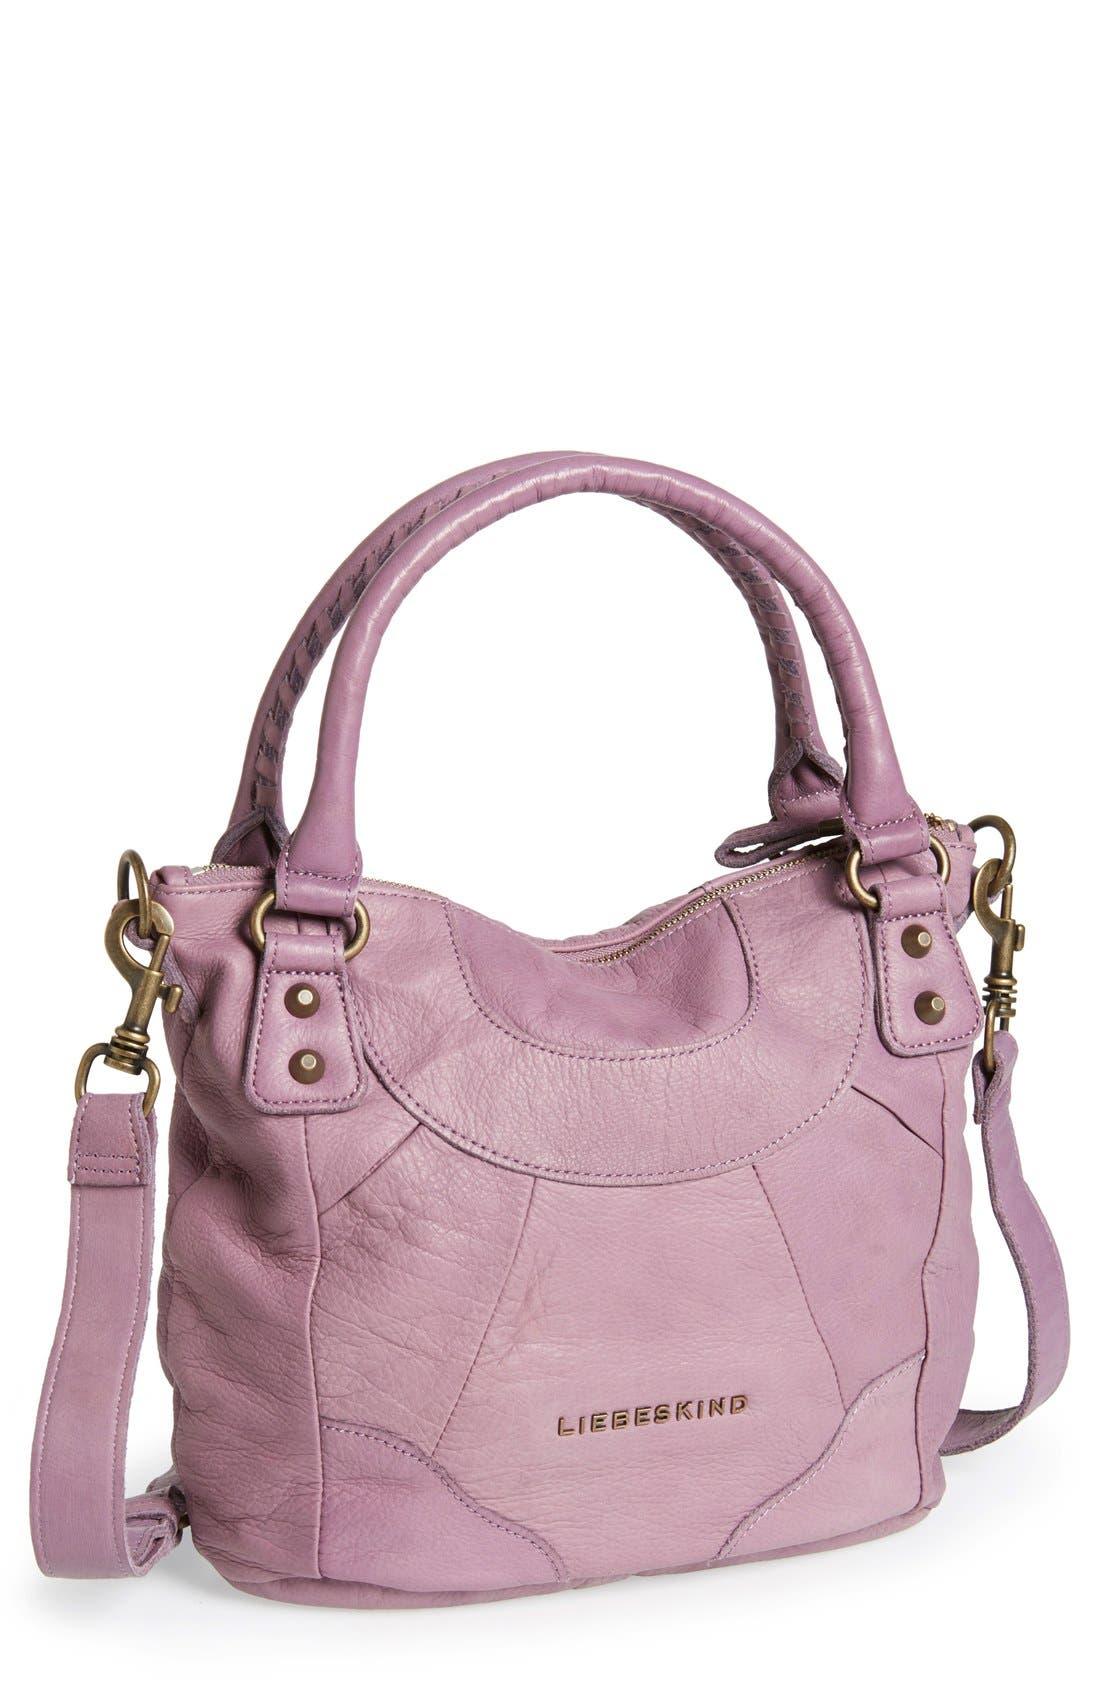 'Vintage Gina' Soft Leather Handbag,                             Main thumbnail 1, color,                             500